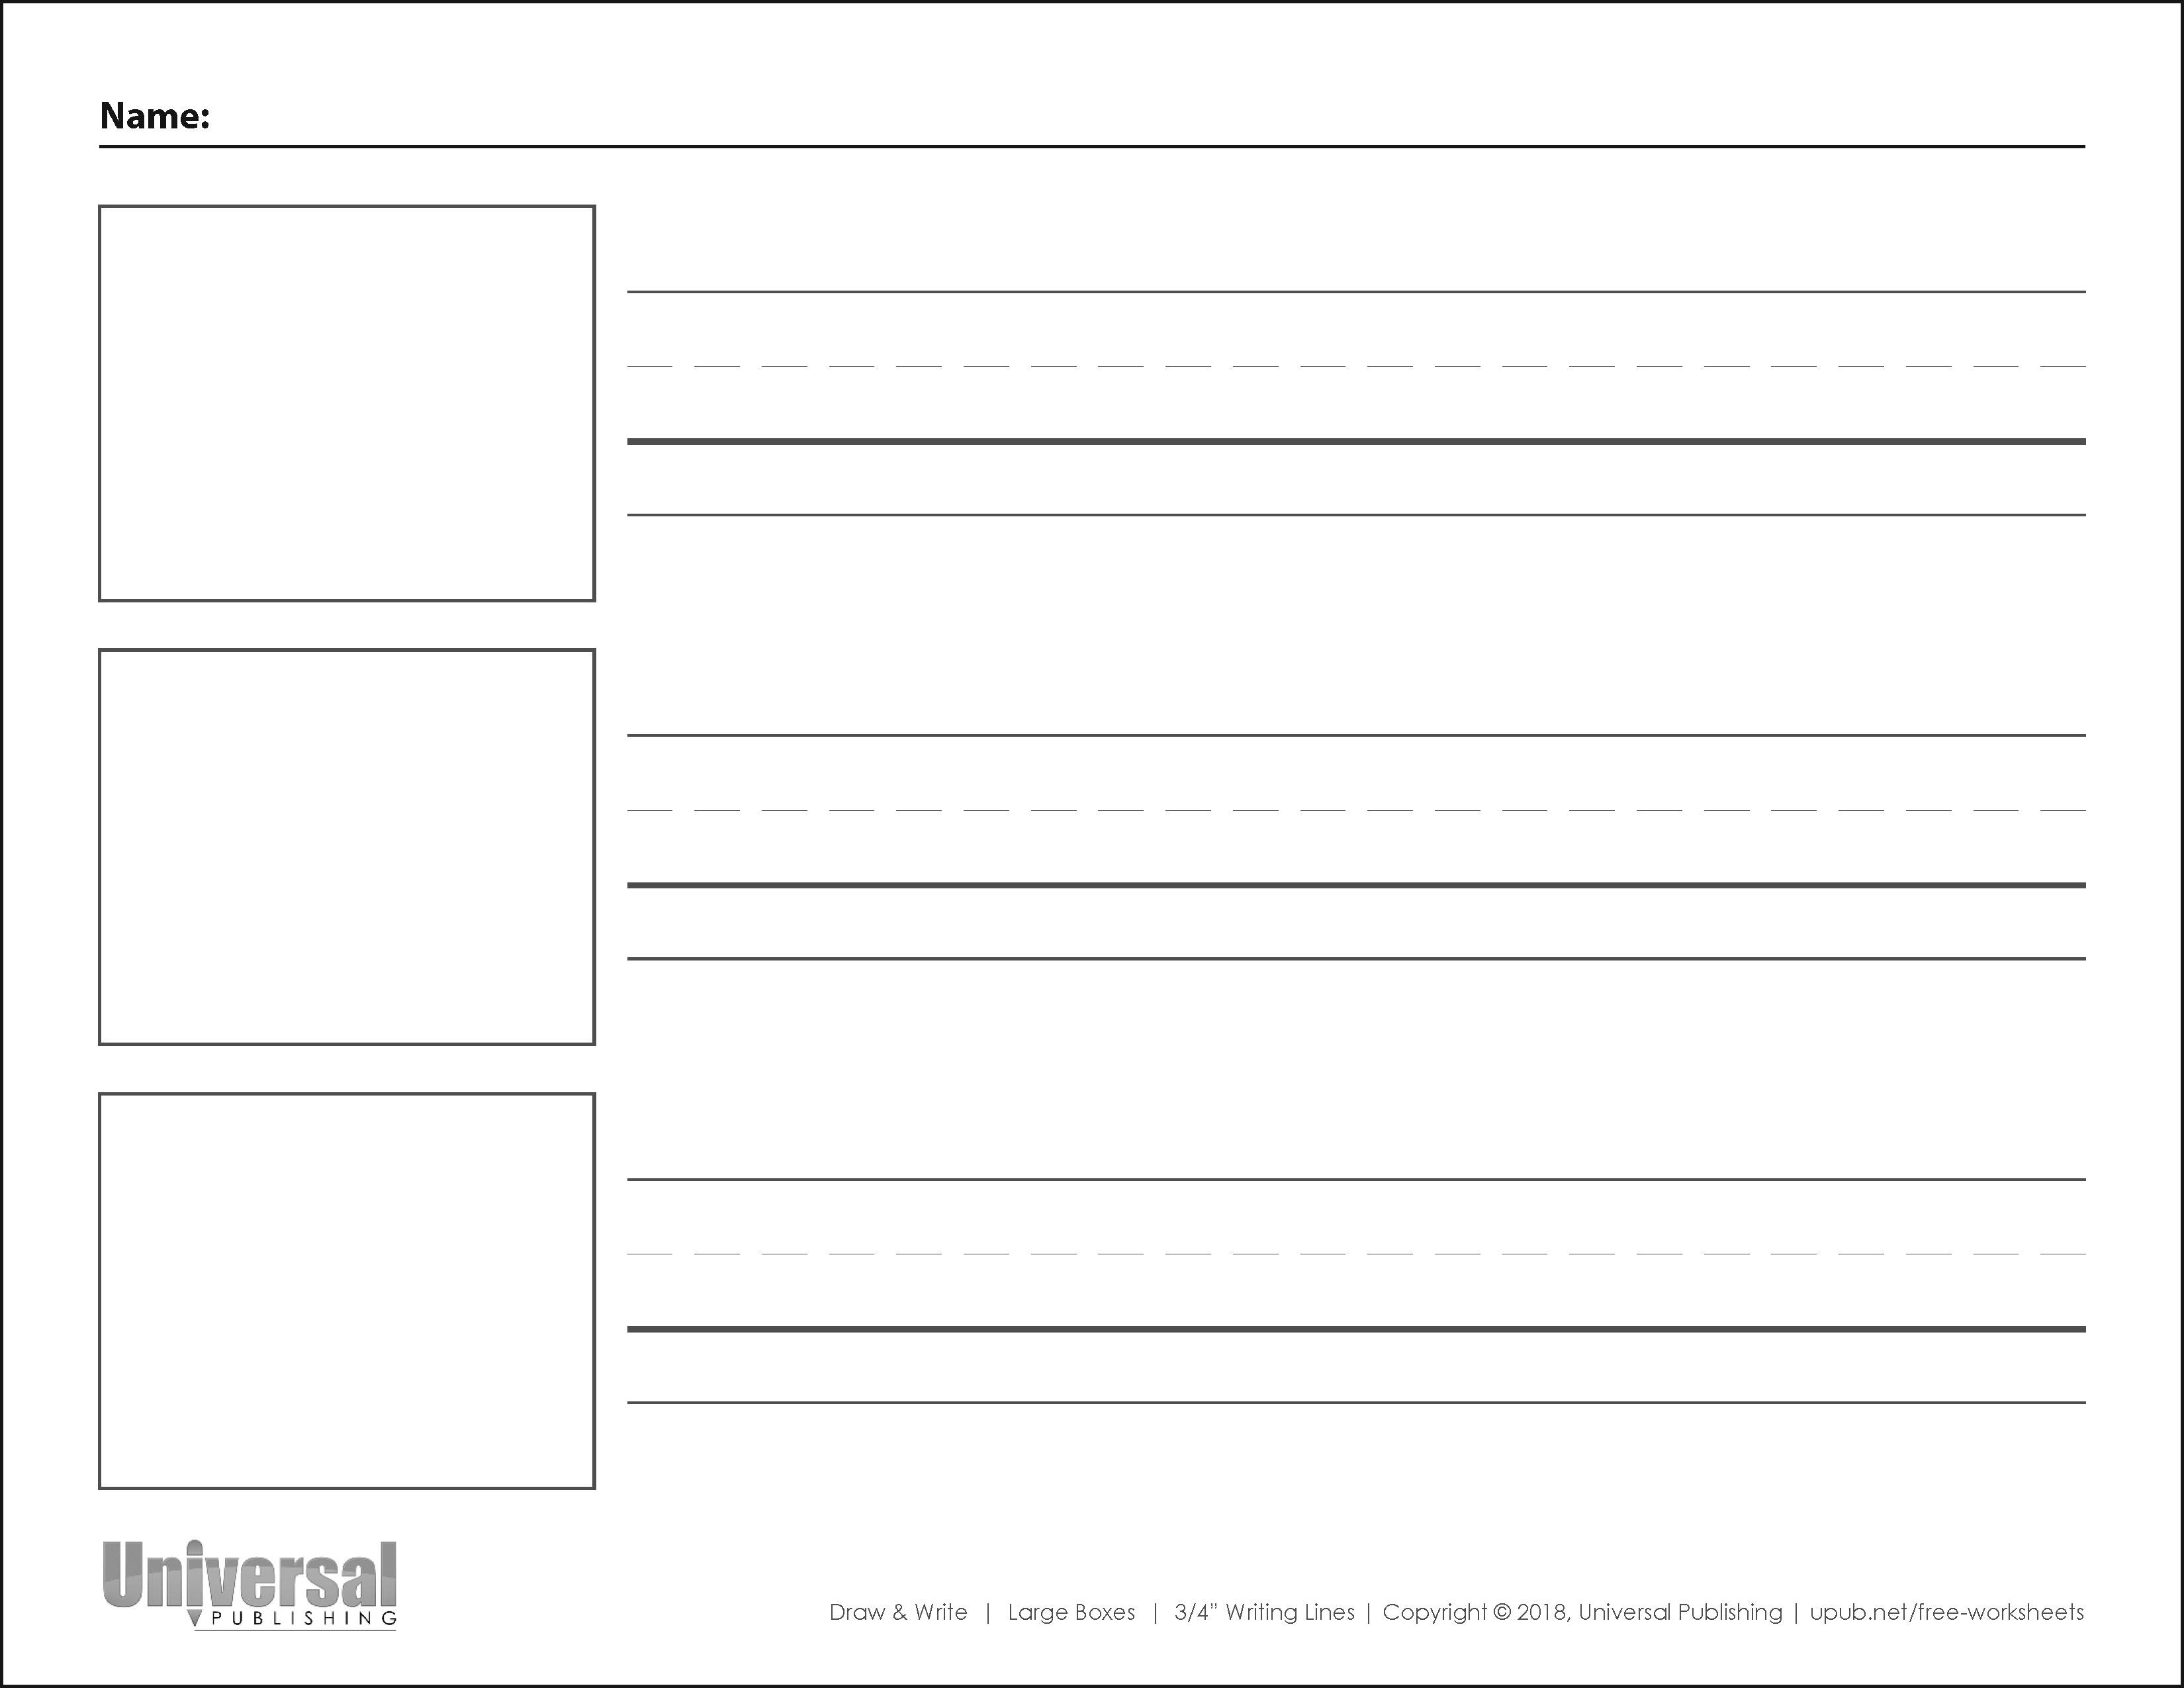 Draw & Write Paper | Free Printables - Universal Publishing Blog - Free Printable Writing Paper With Picture Box